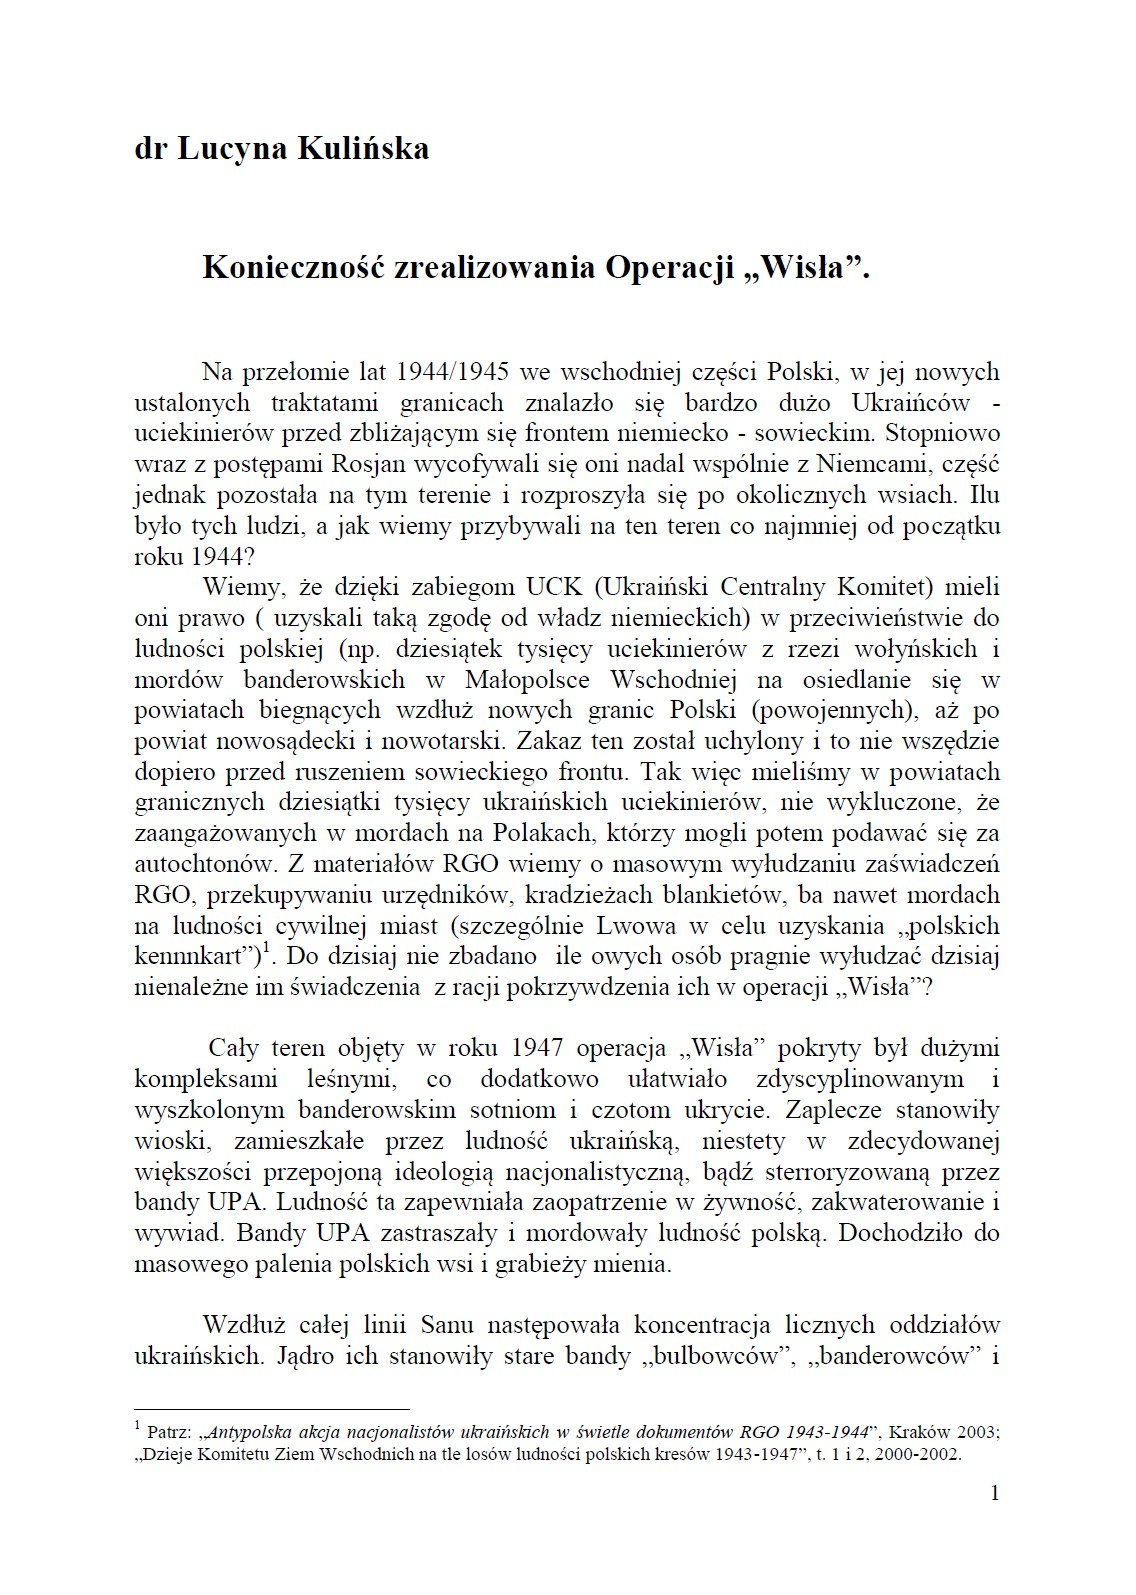 dr_lucyna_kulinska_1